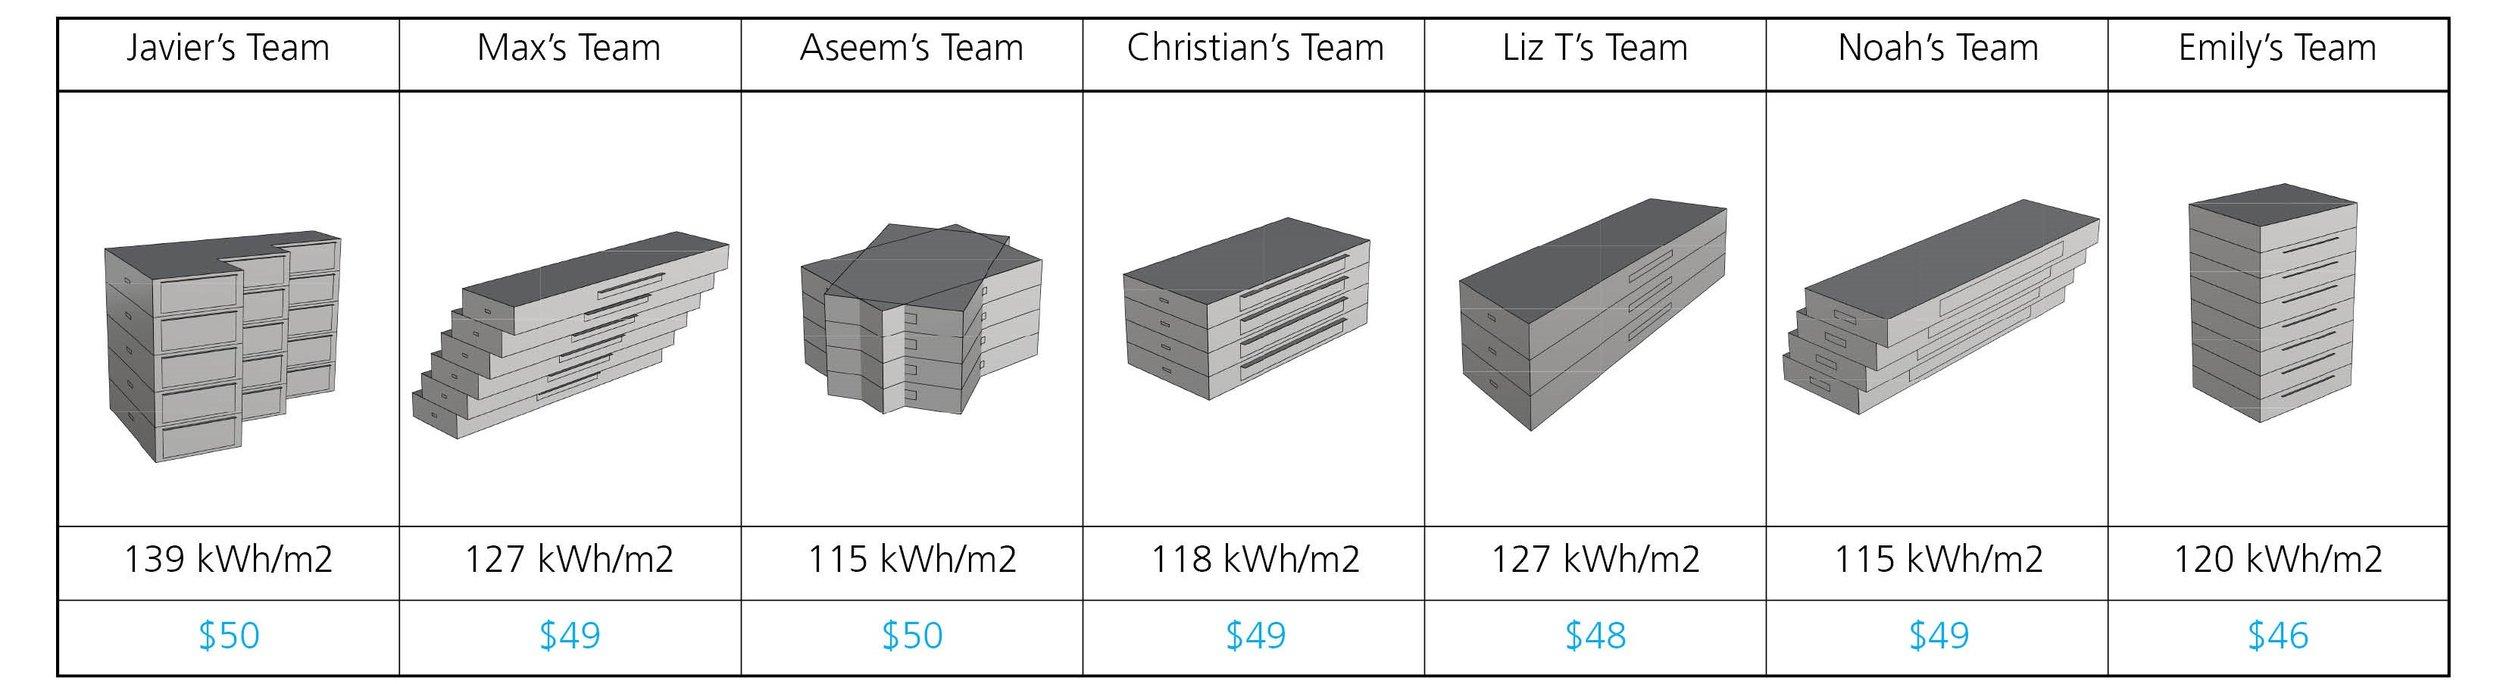 team comparison.jpg